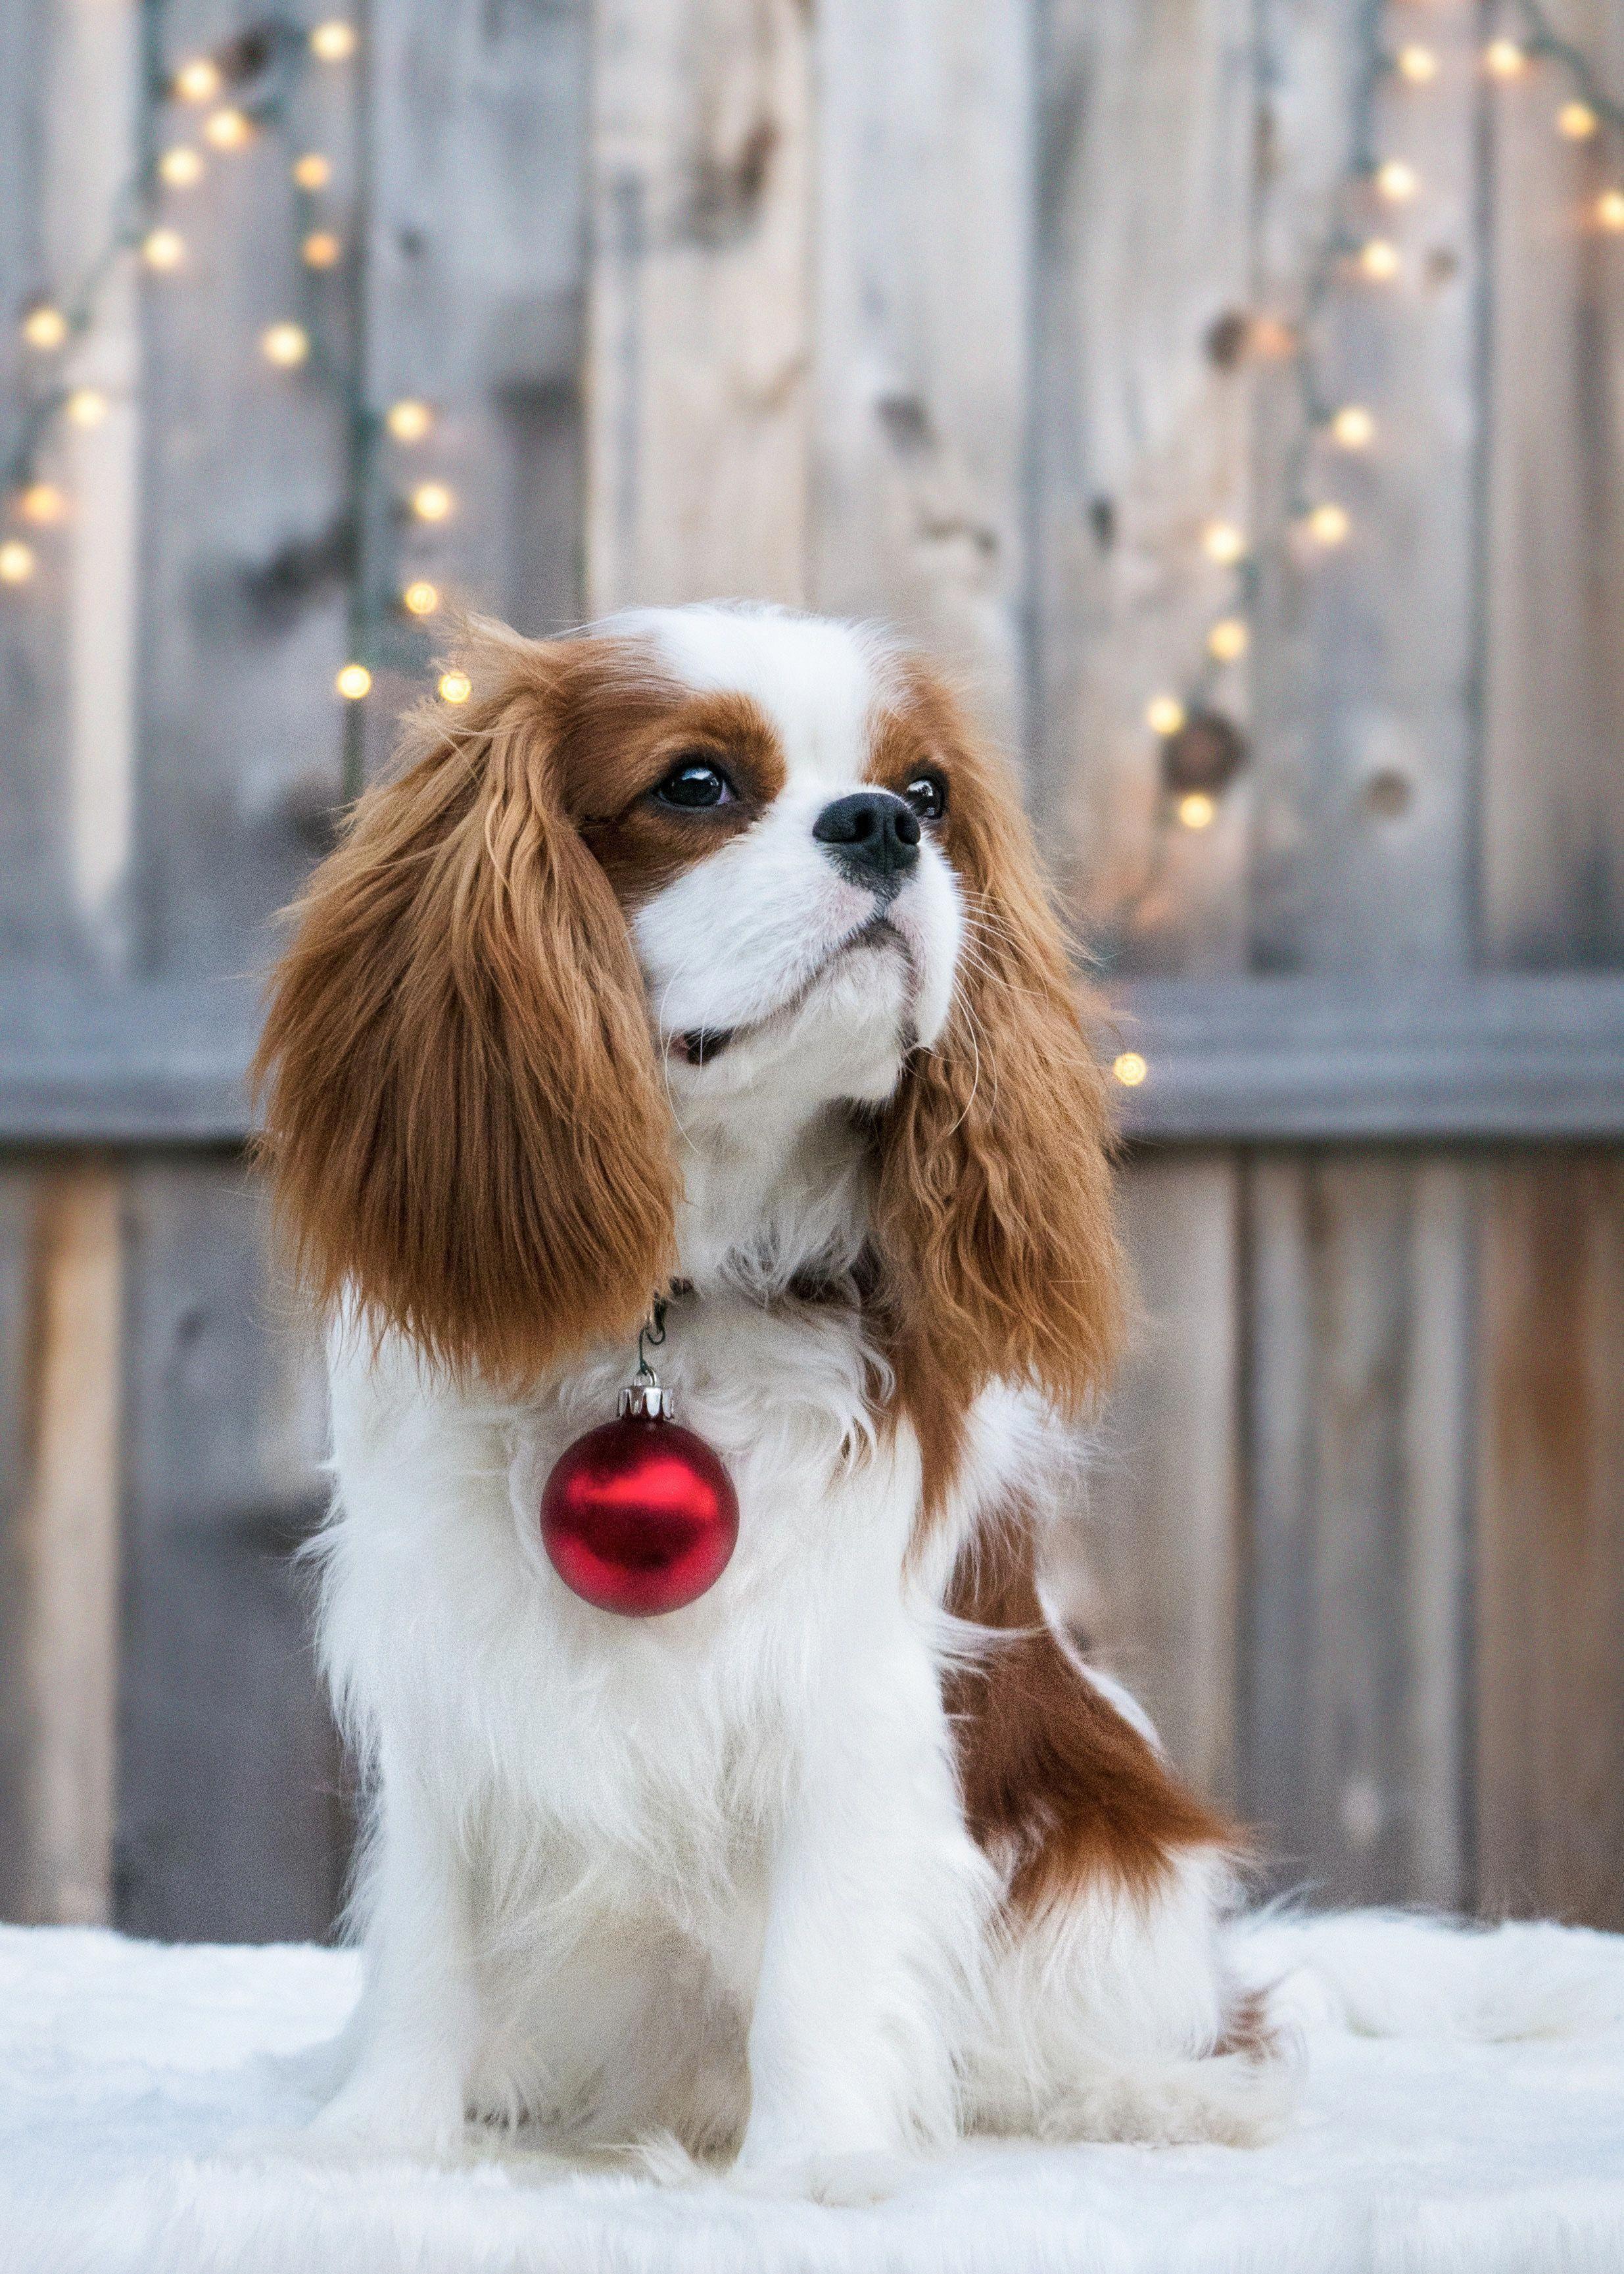 More About Cute Cavalier King Charles Spaniel Grooming Cavalierkingcharles Cavalier King Charles Dog King Charles Cavalier Spaniel Puppy Cavalier King Spaniel